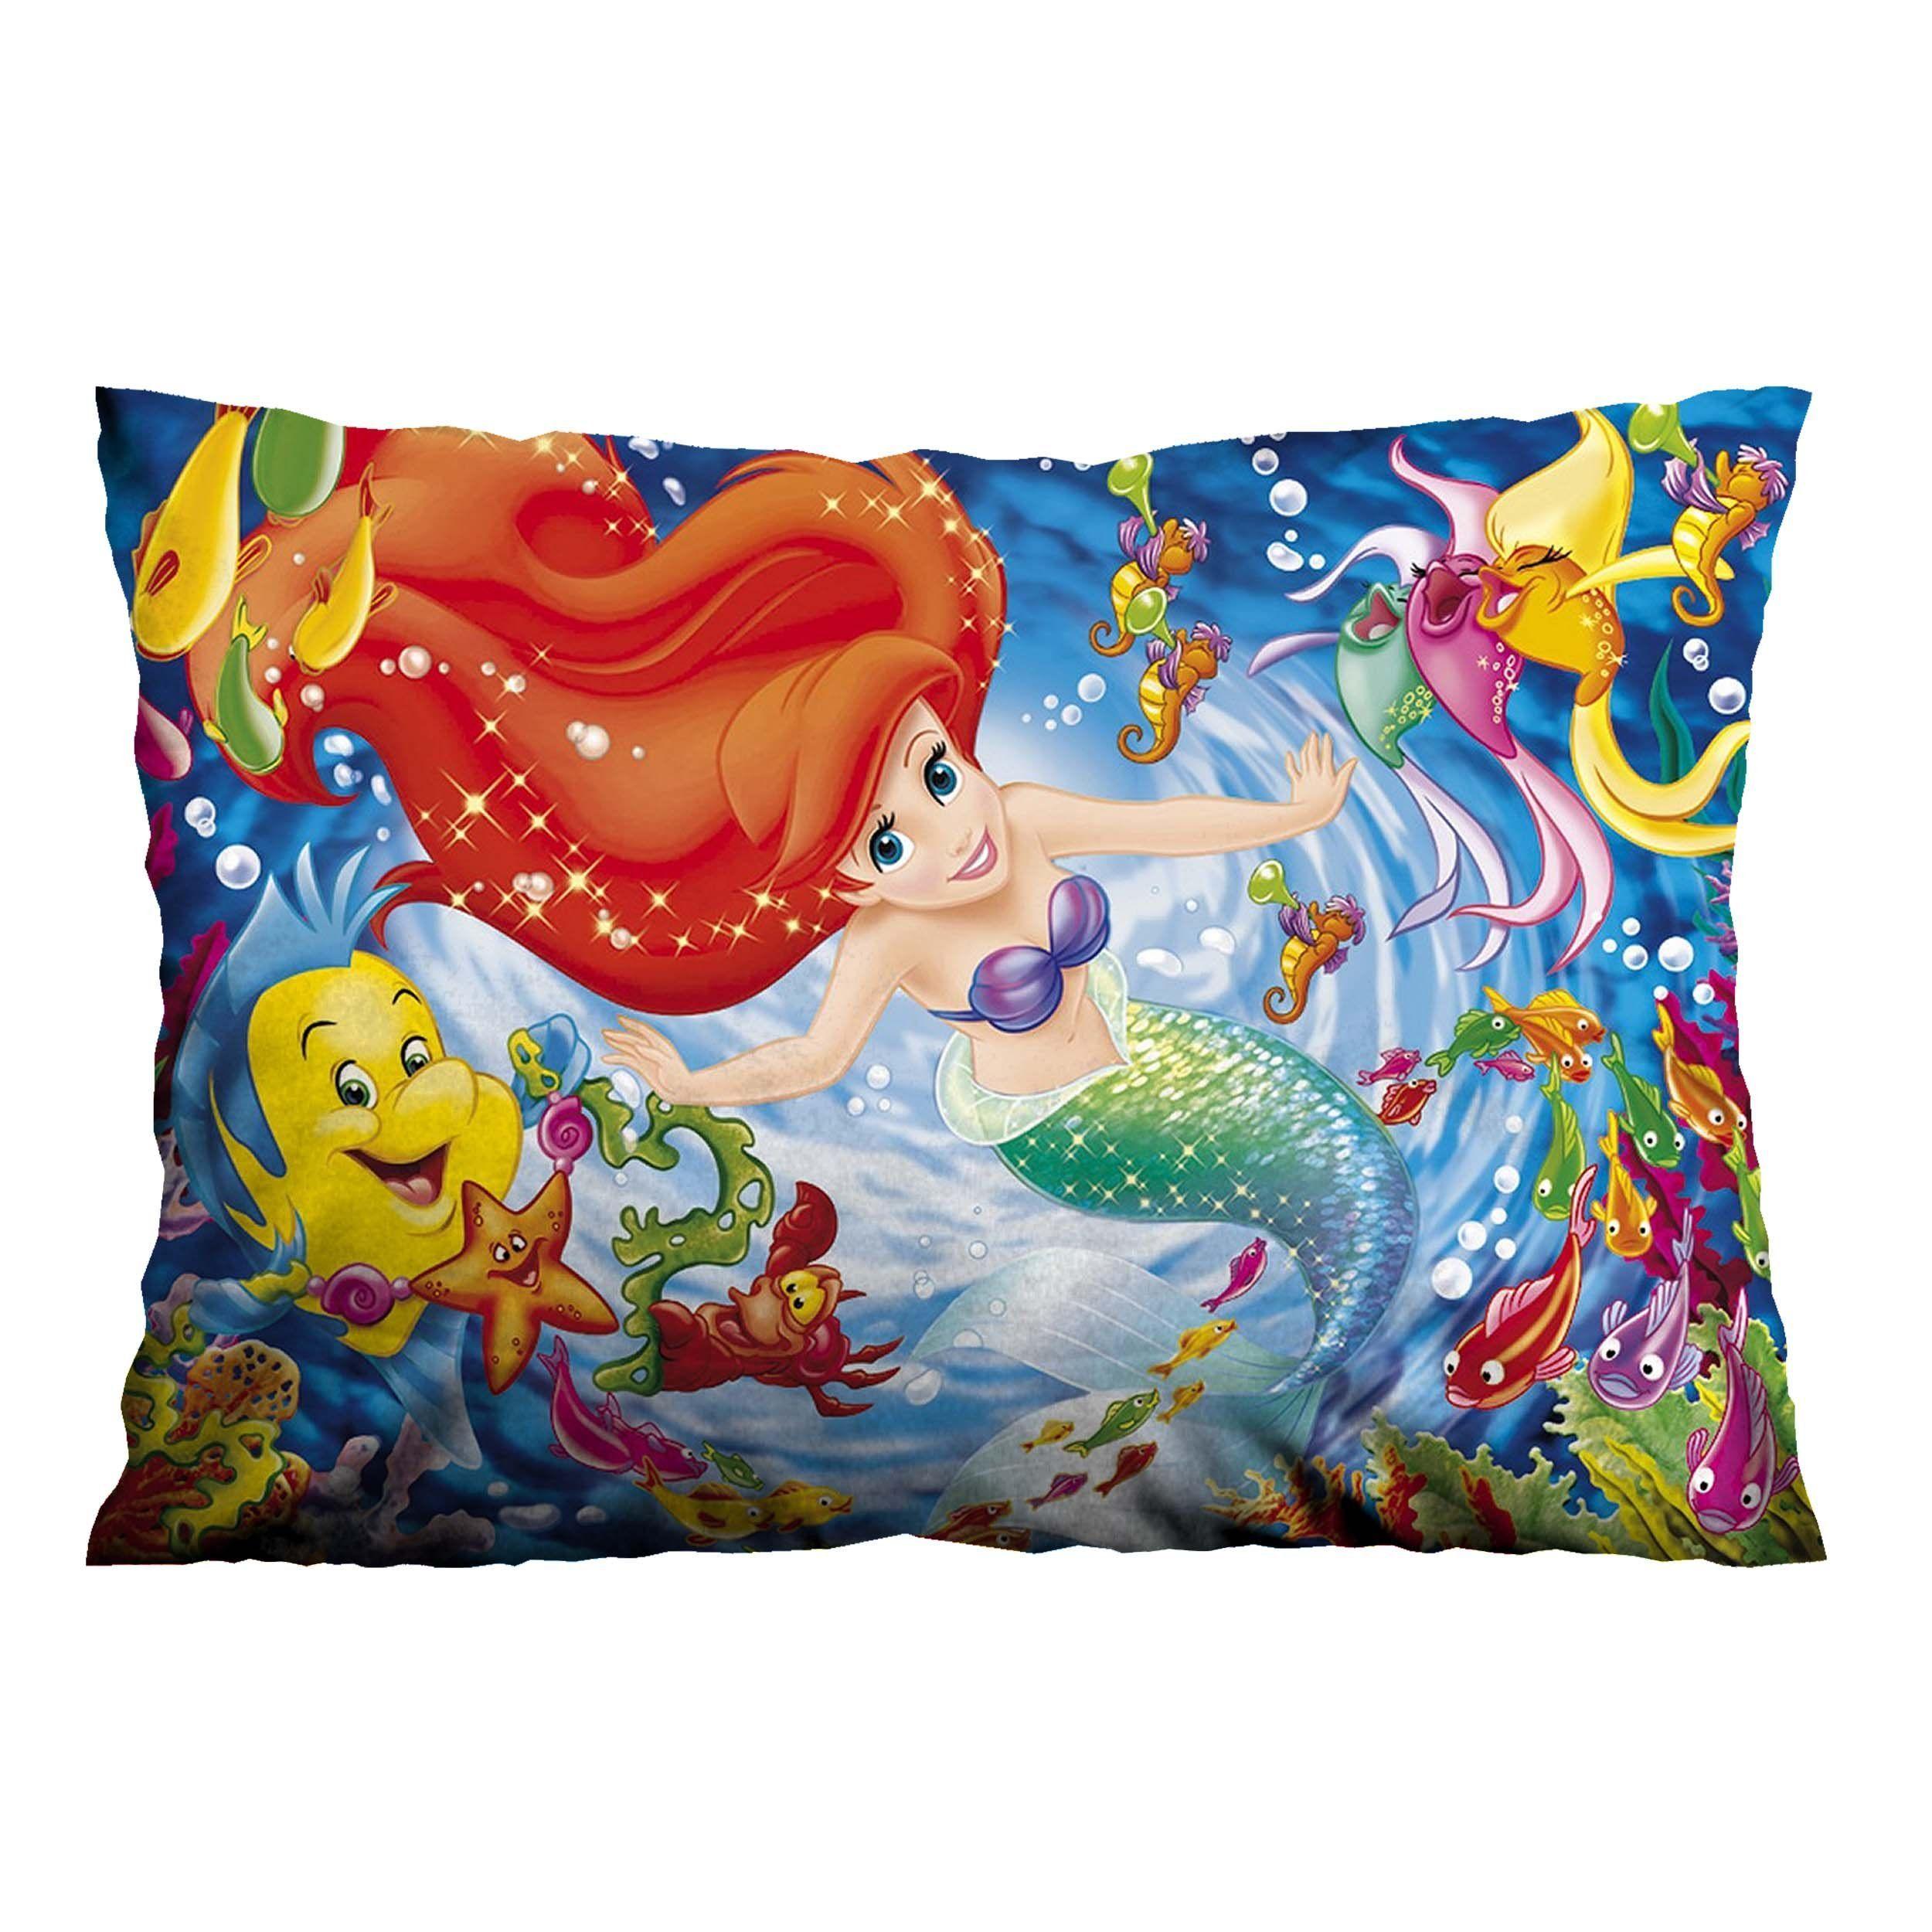 LITTLE MERMAID ARIEL Pillow Case Cover